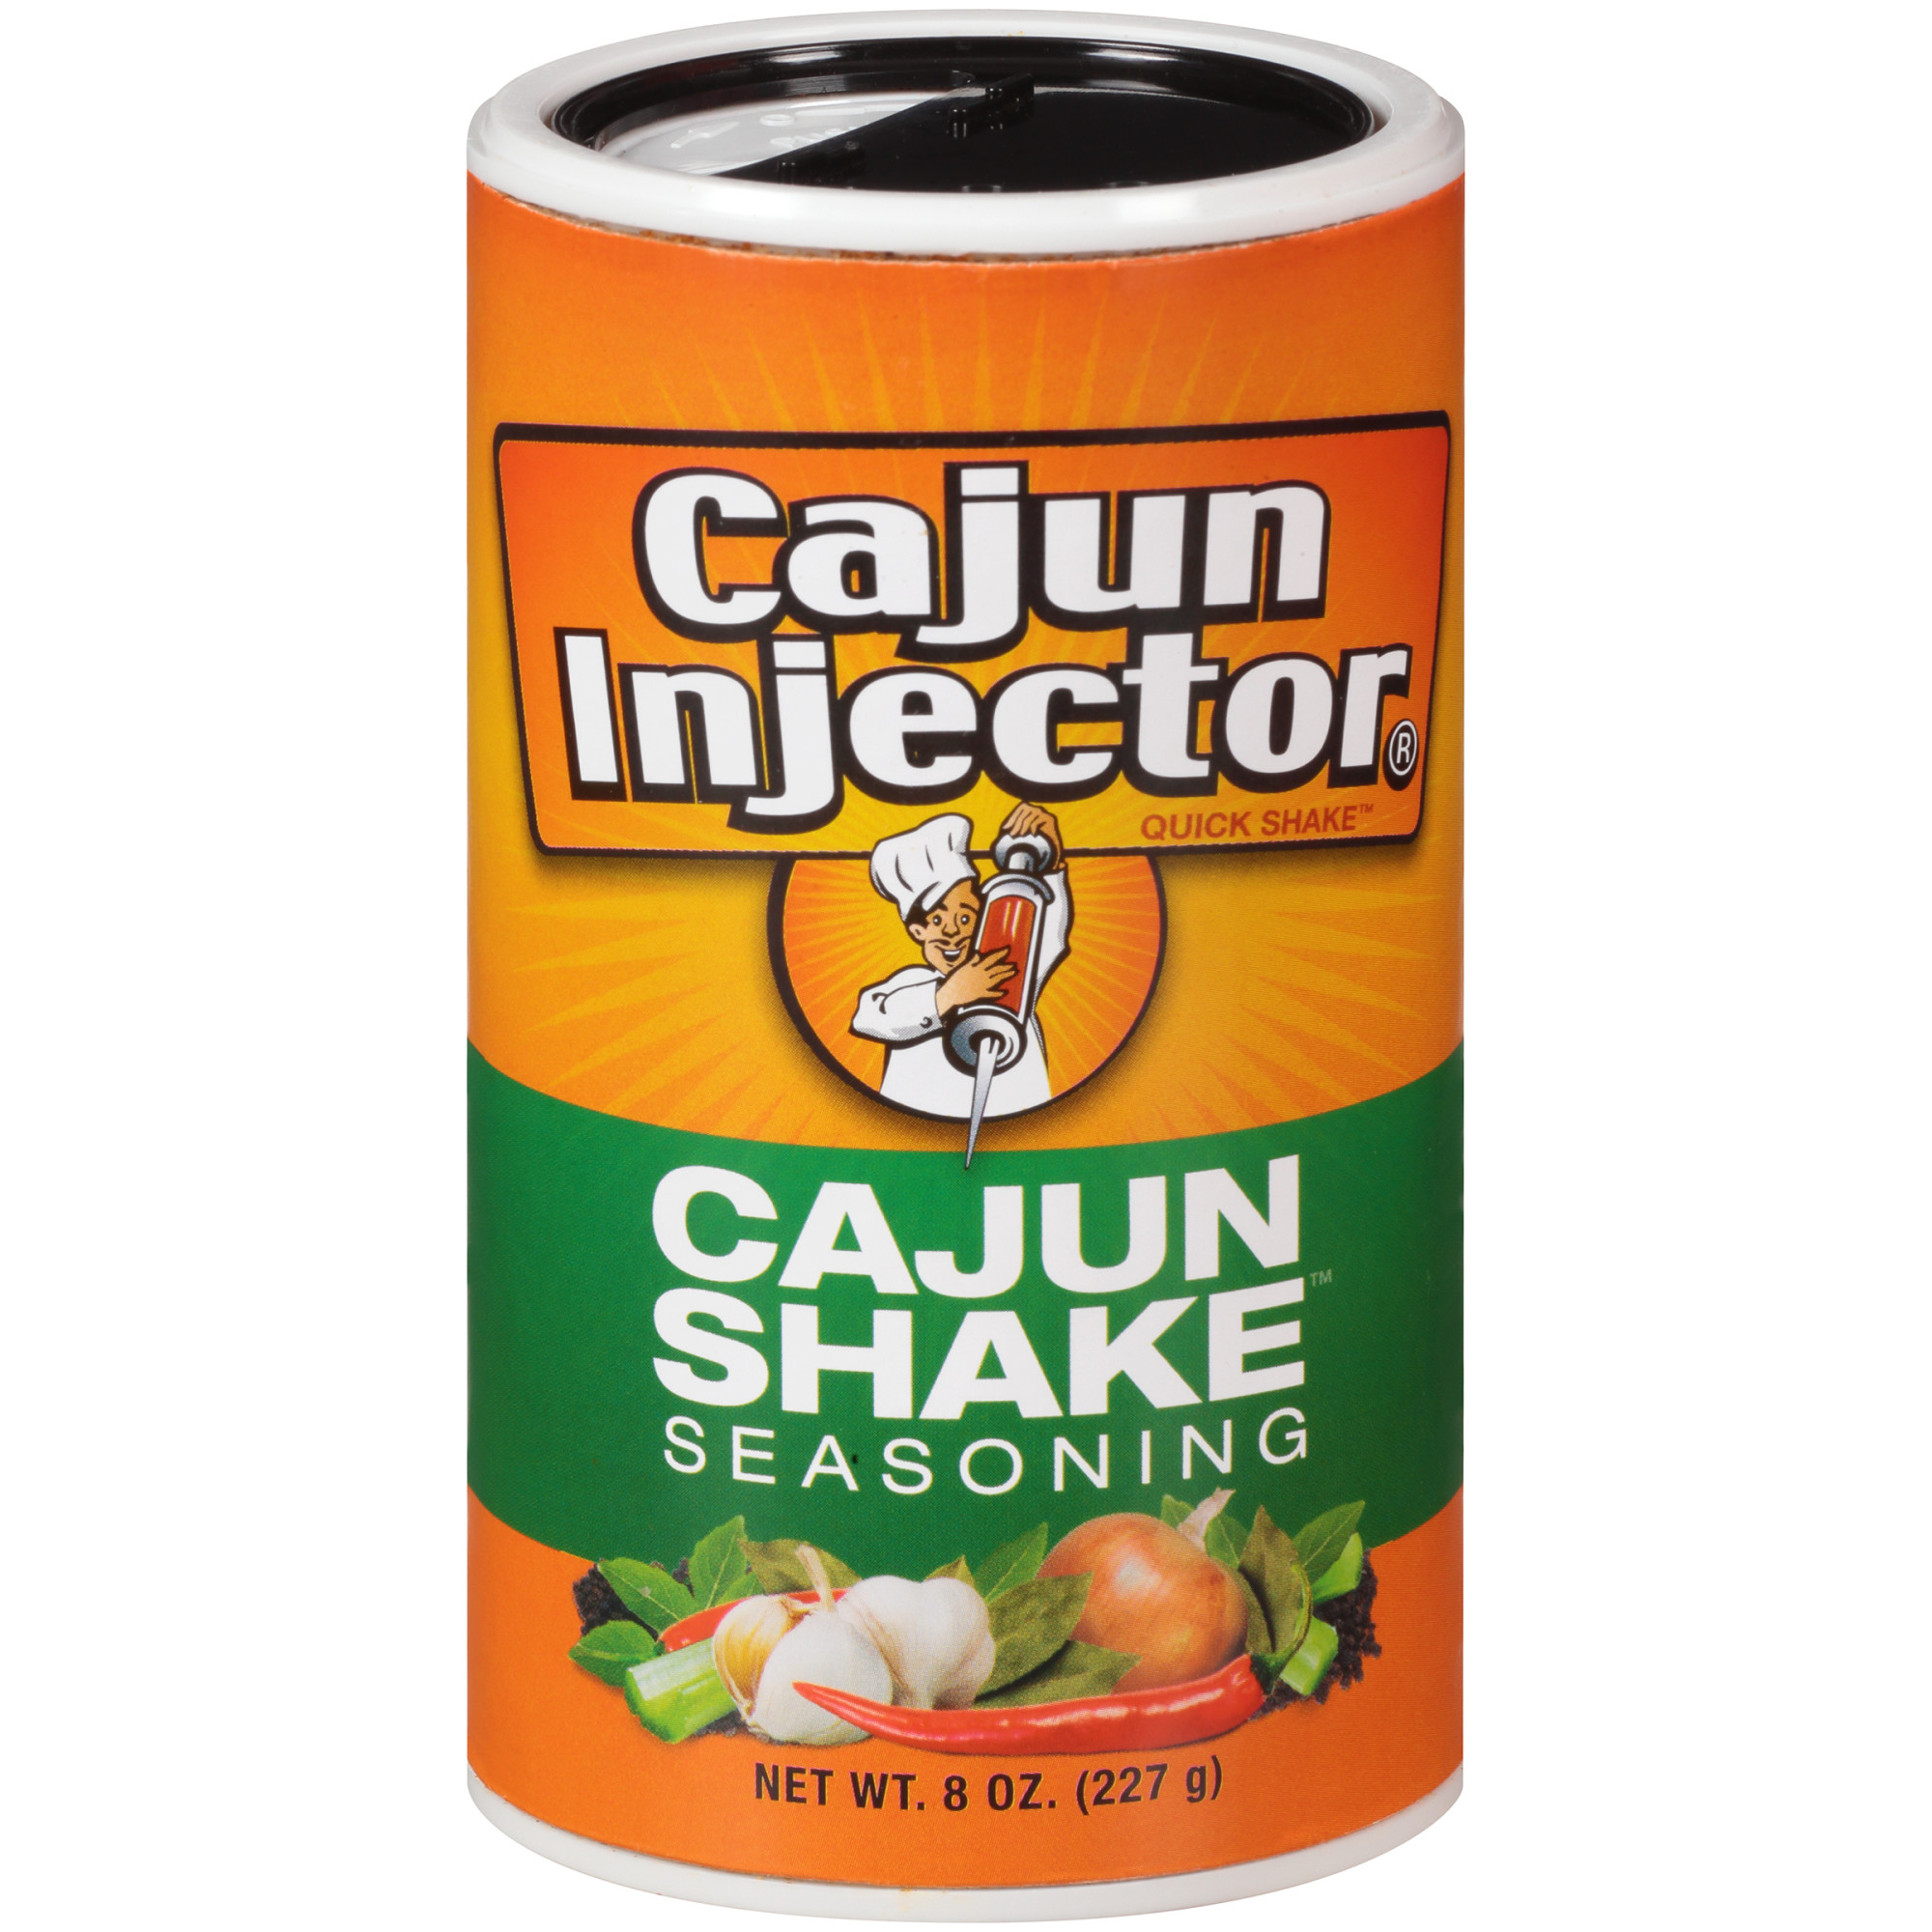 (3 Pack) Zatarain's Cajun Injectors Cajun Shake Seasoning, 8 oz